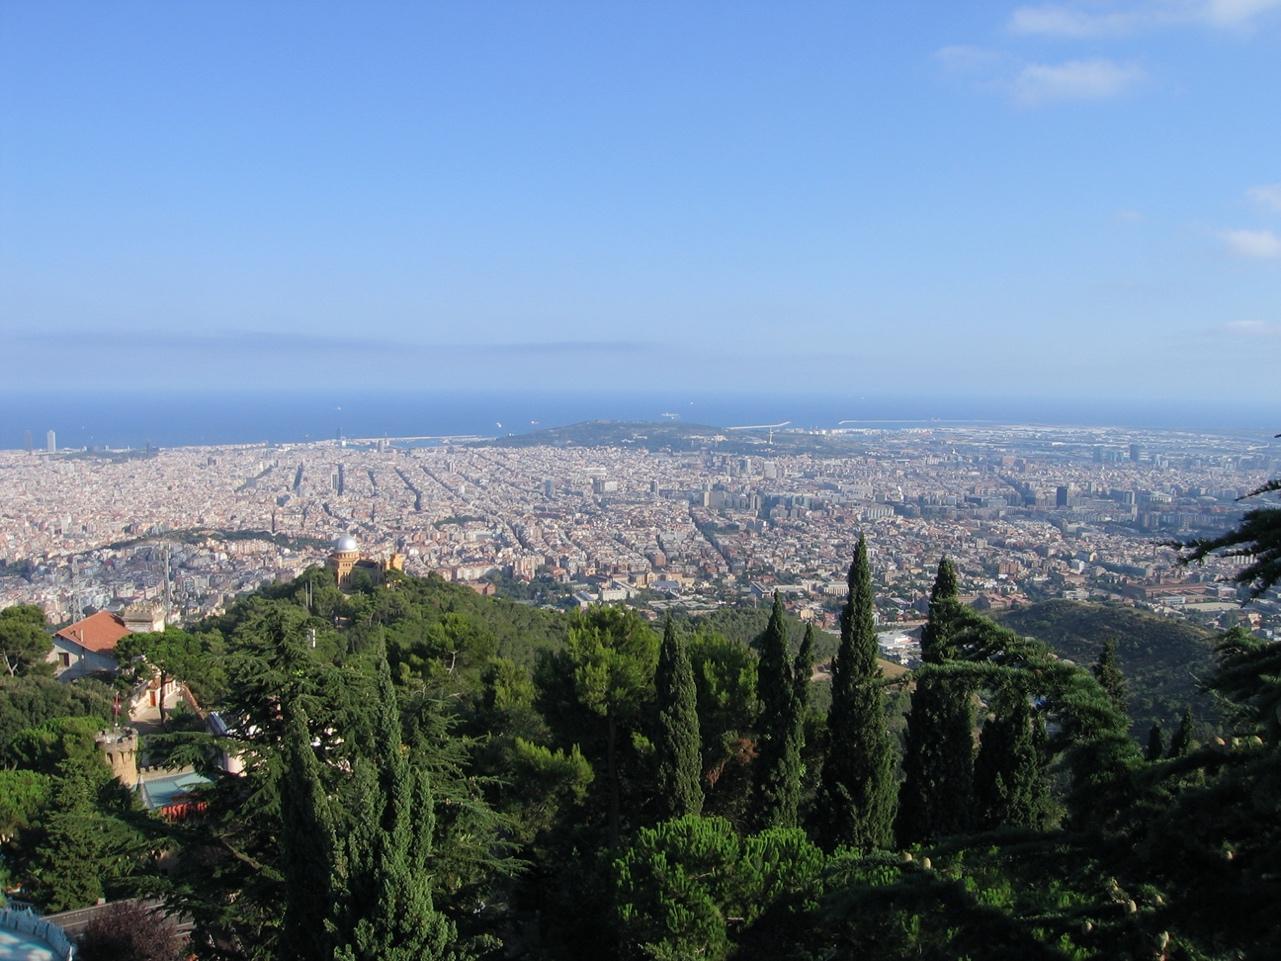 mirador d'horta swing view barcelona